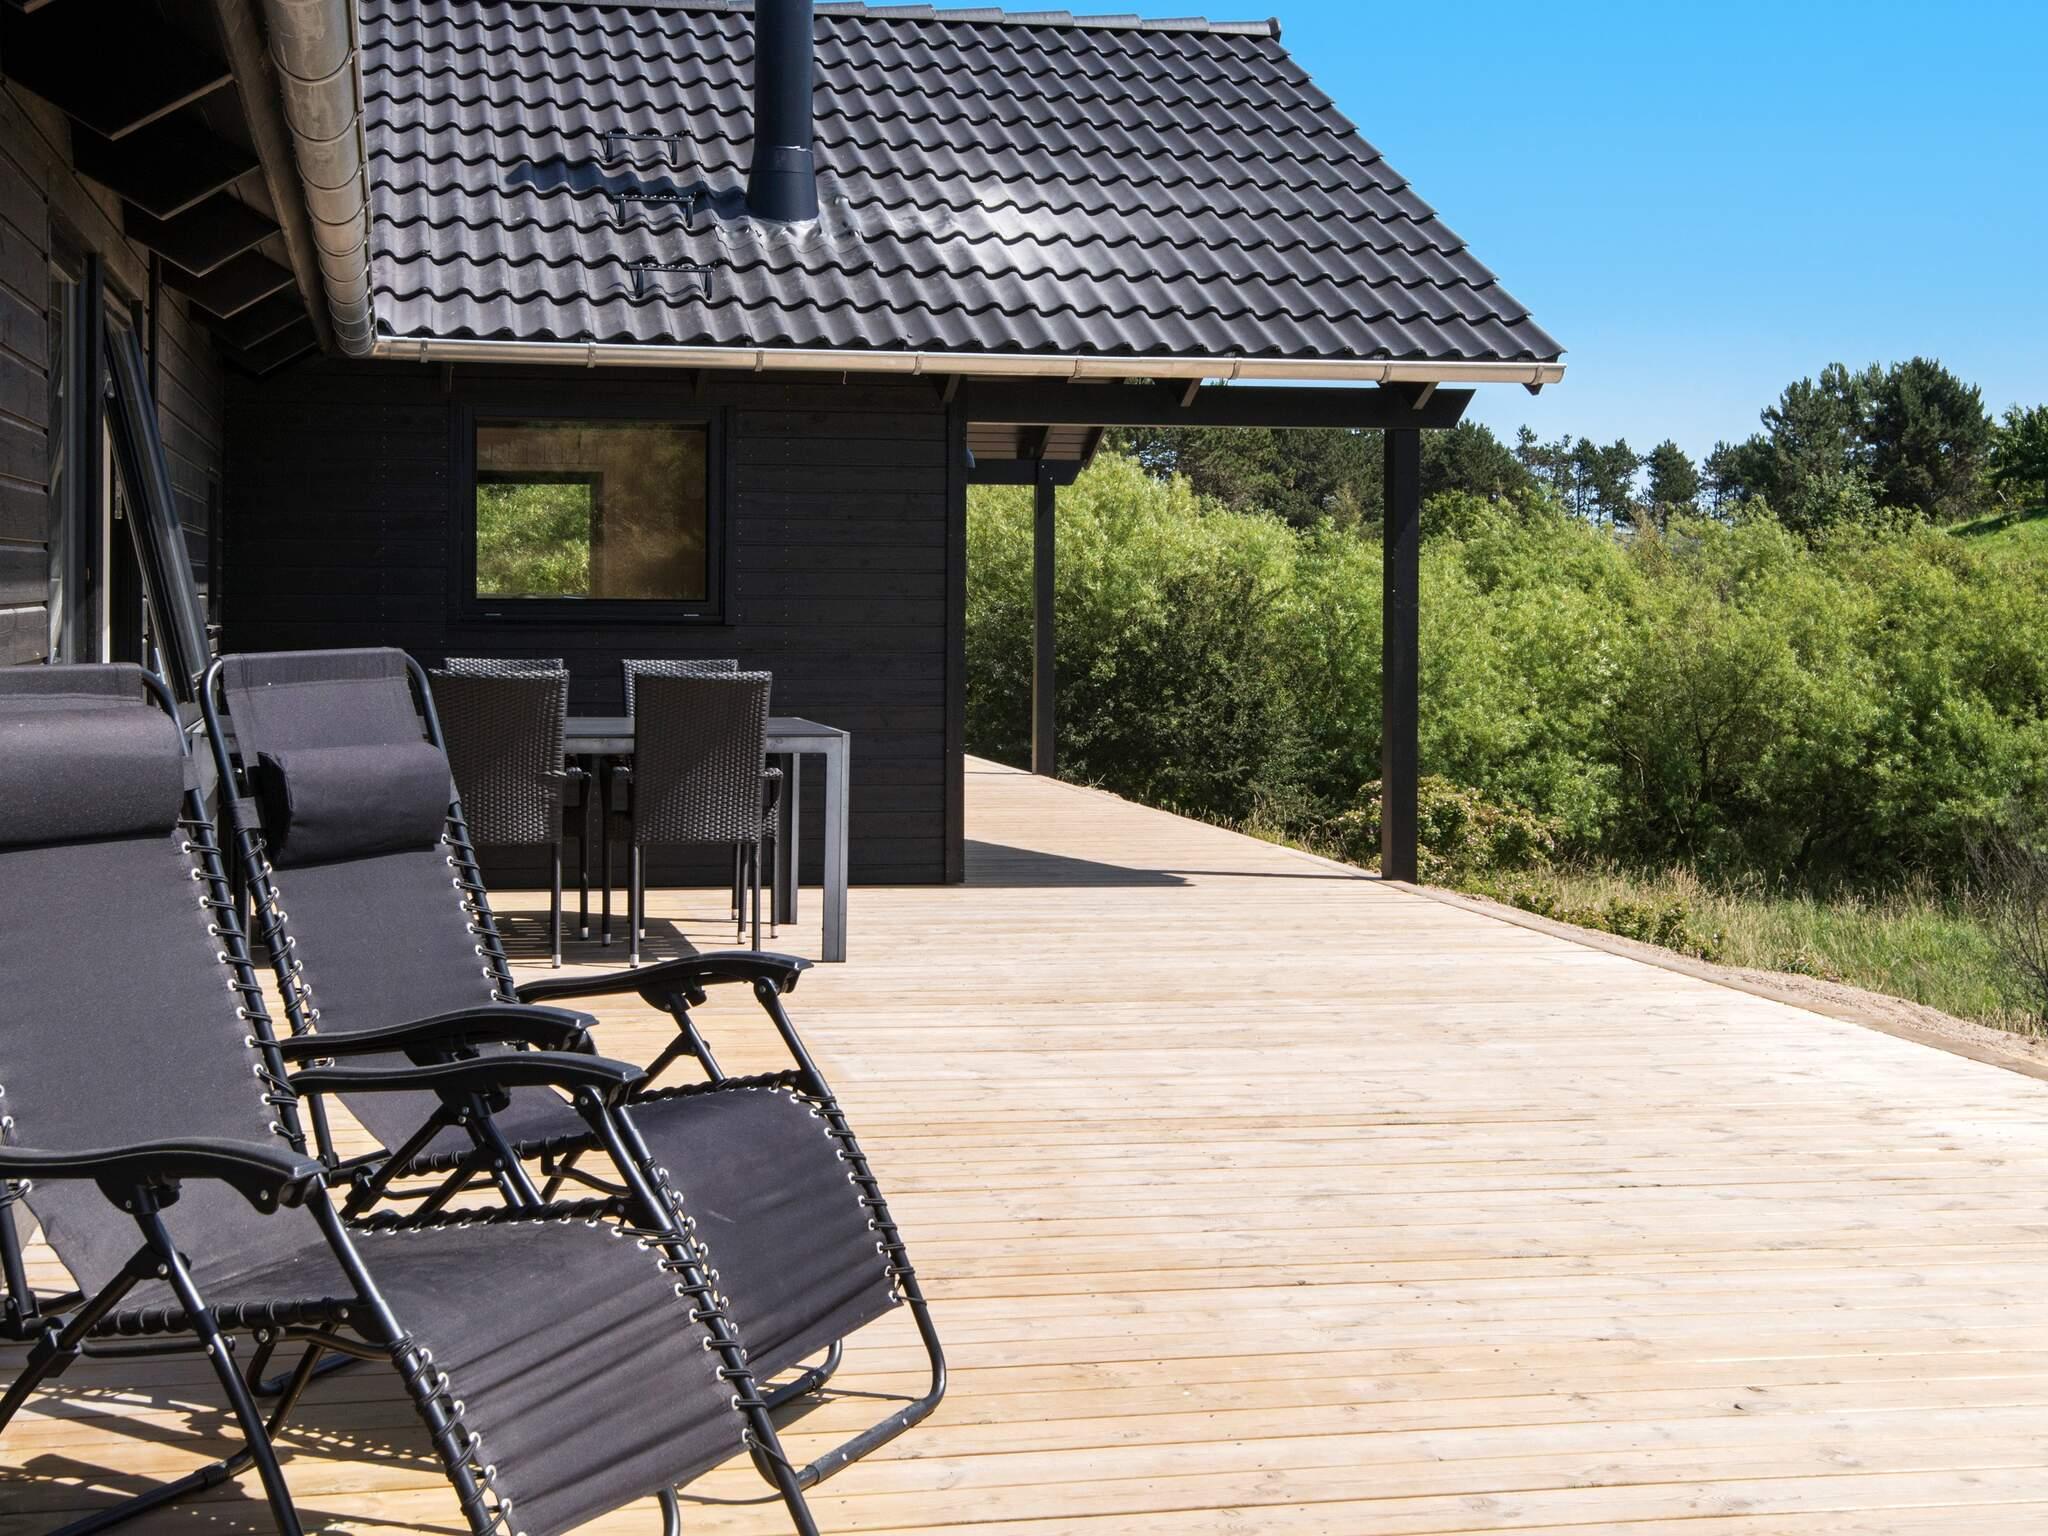 Maison de vacances Helgenæs (2597444), Knebel, , Mer Baltique danoise, Danemark, image 25